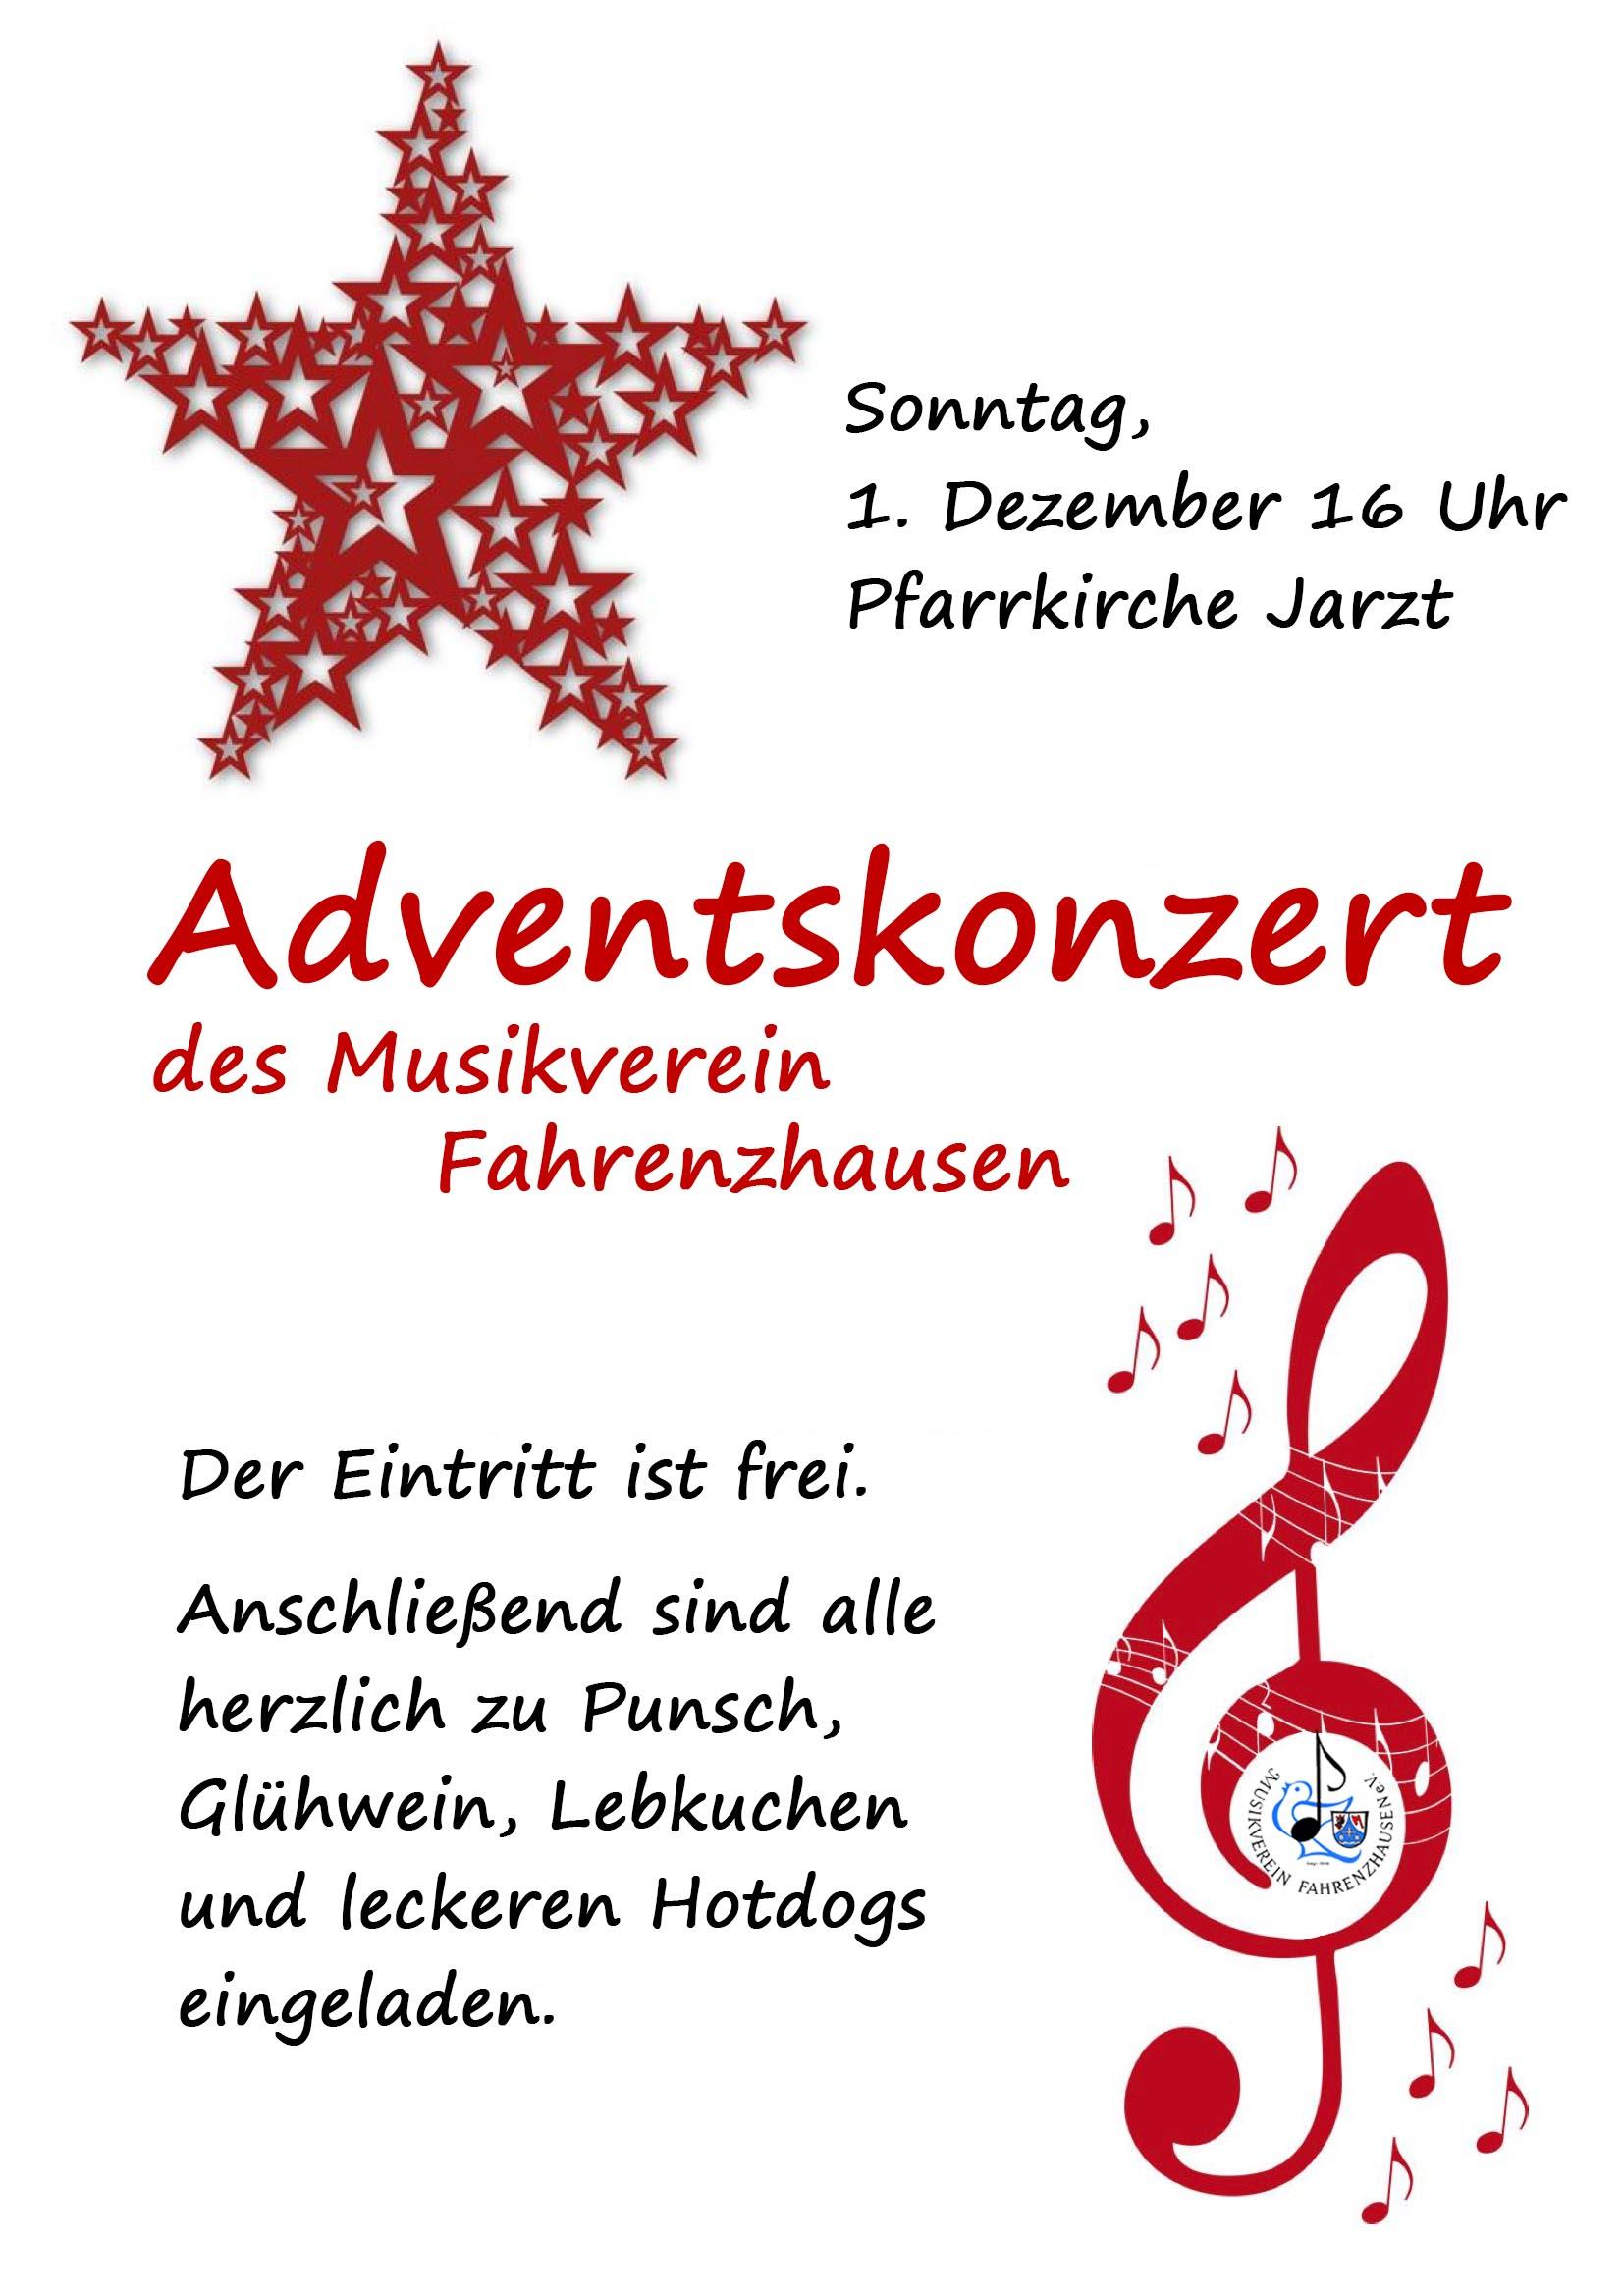 Adventskonzert 2019 @ Pfarrkirche Jarzt